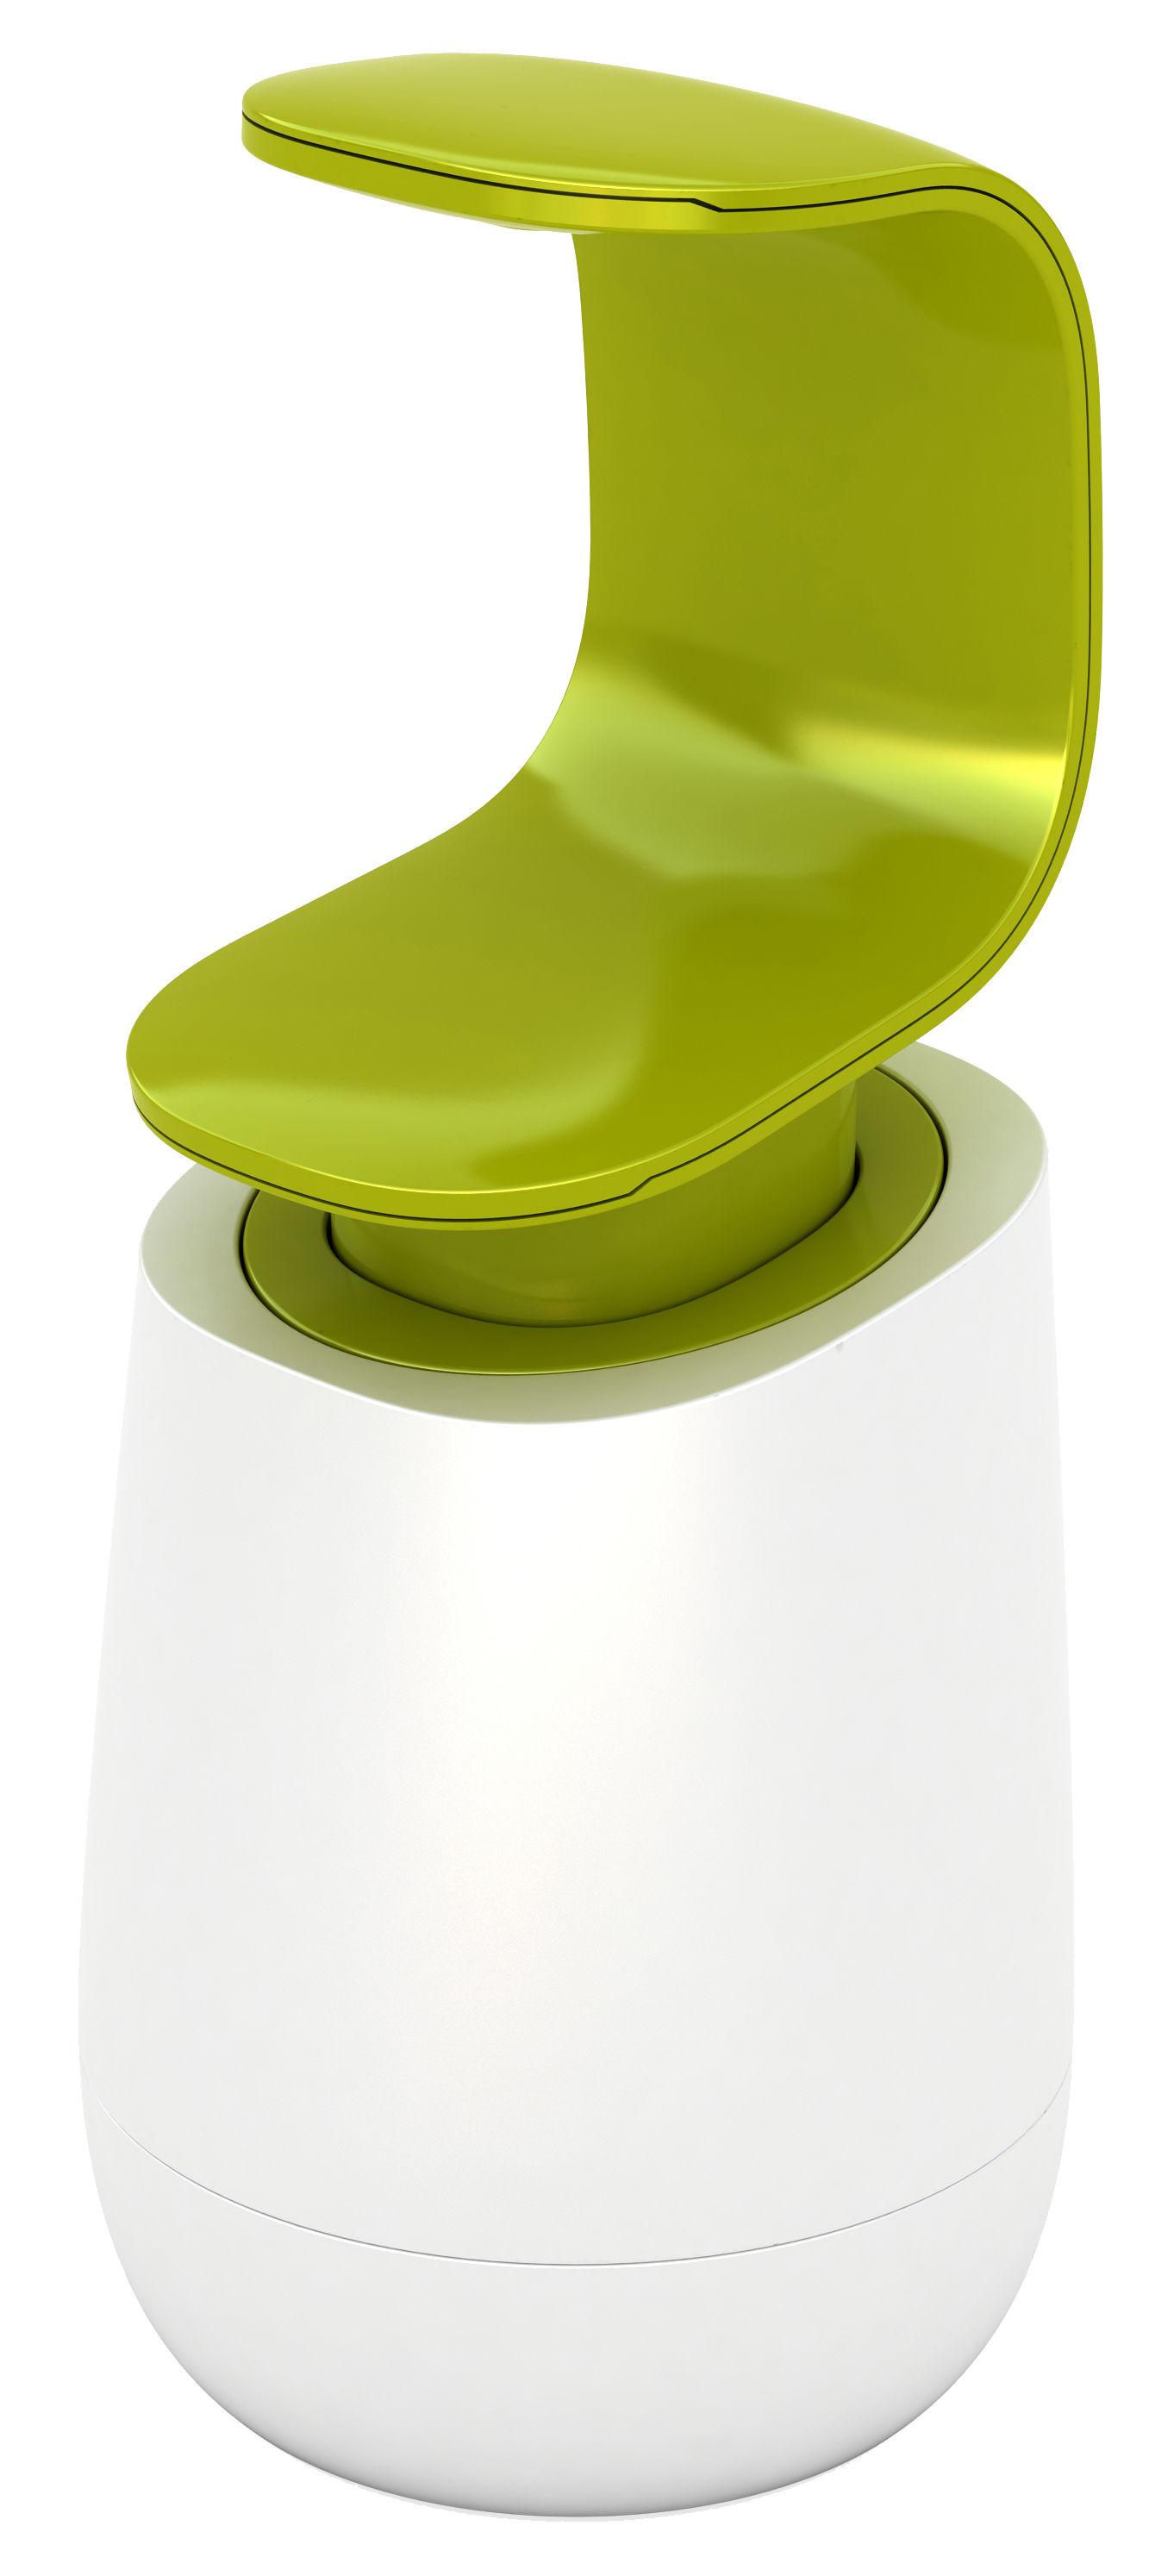 Accessories - Bathroom Accessories - C-Pump Soap dispenser by Joseph Joseph - White - Green - ABS